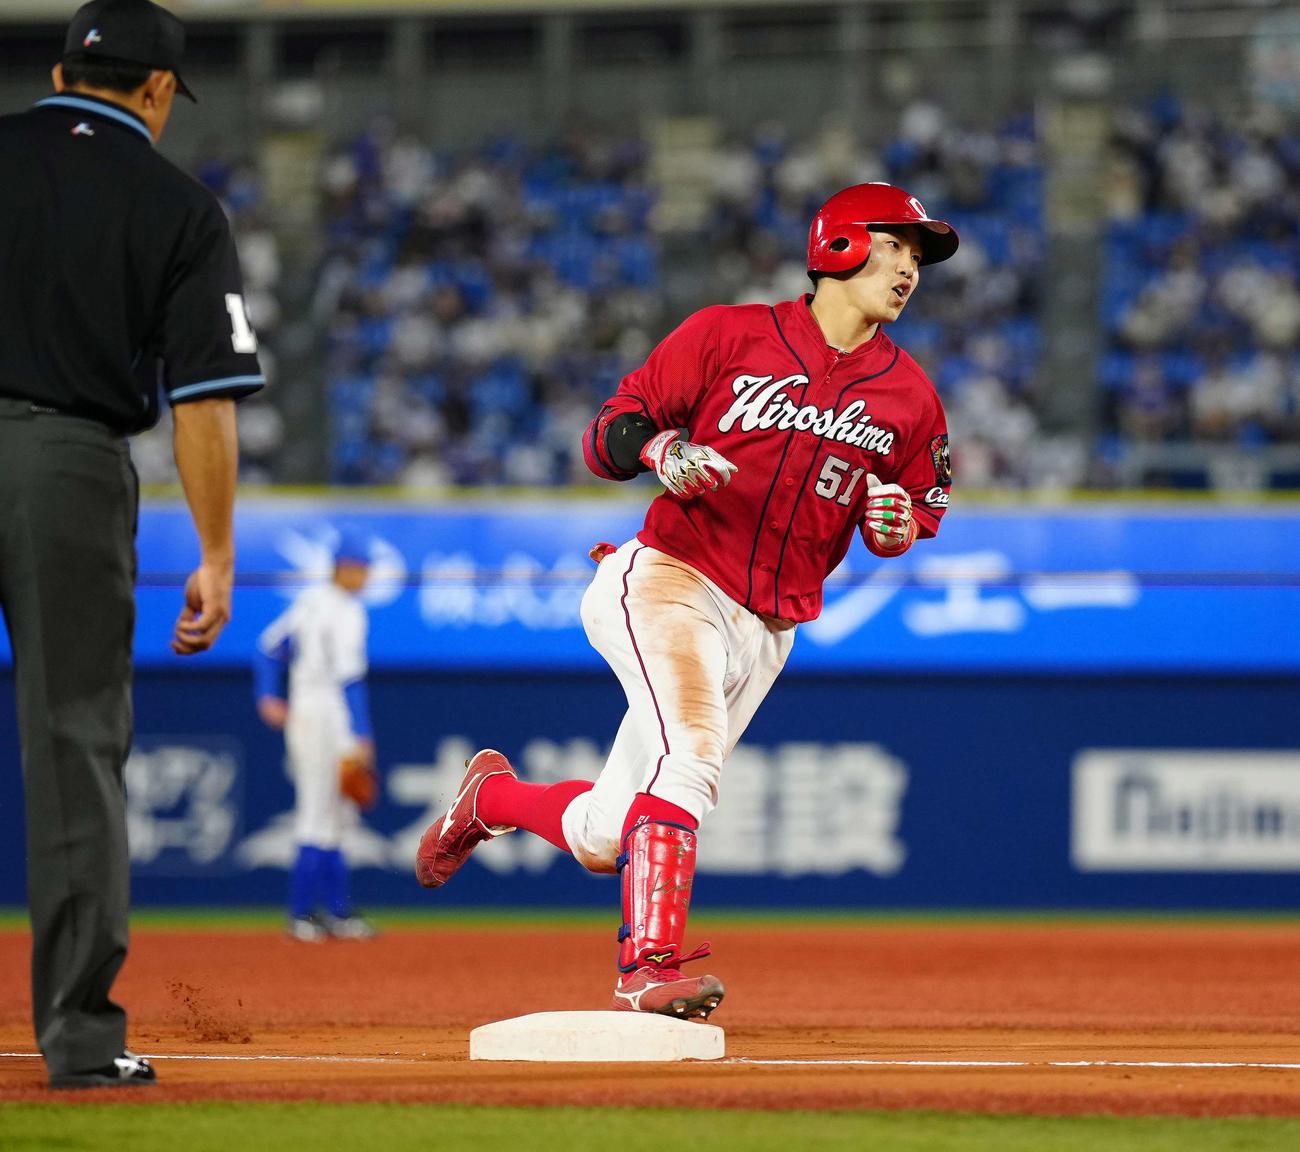 DeNA対広島 5回表広島無死一塁、2点本塁打を放ち三塁を回る小園(撮影・江口和貴)